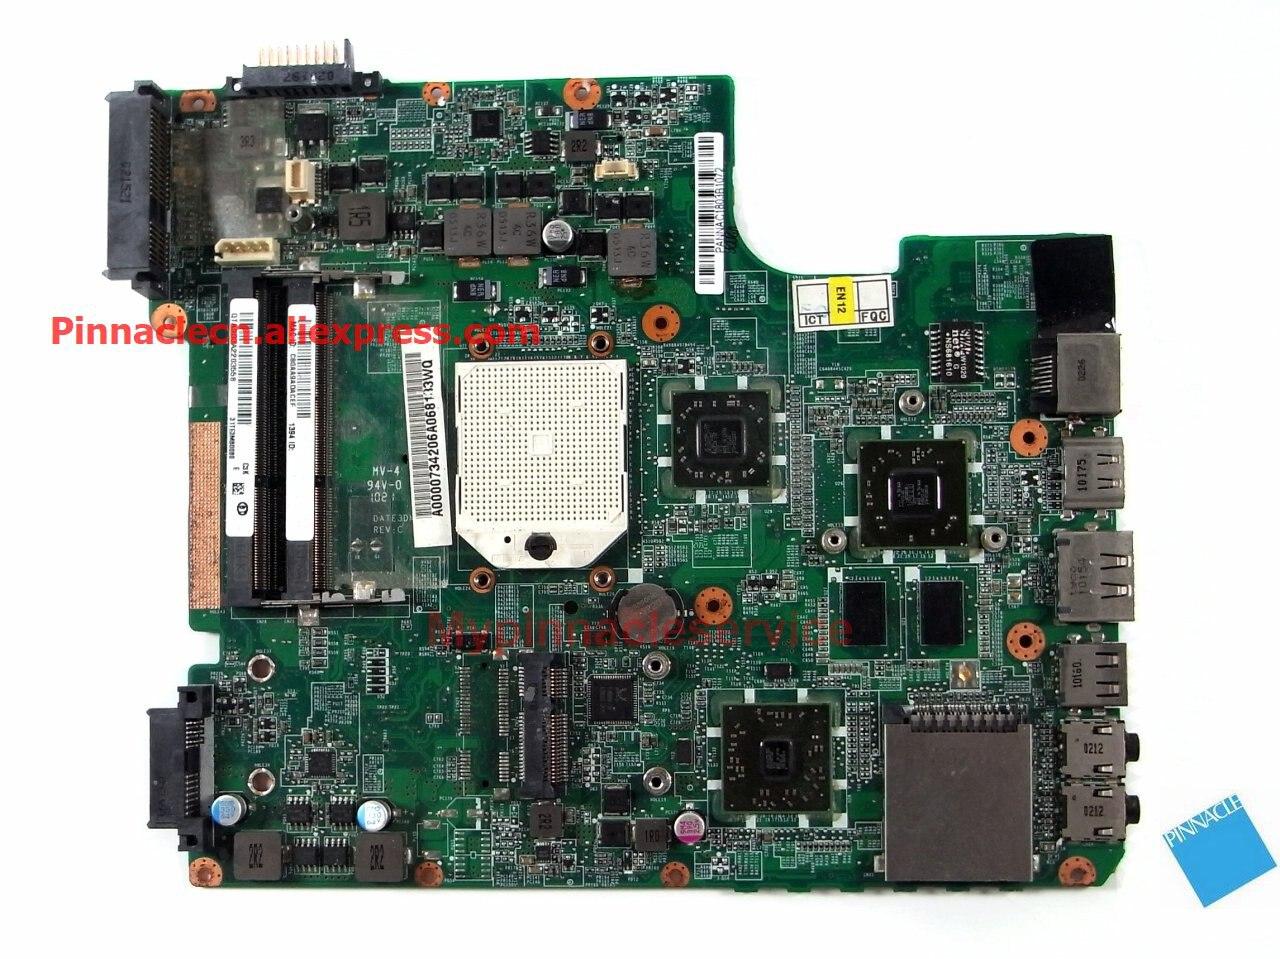 A000073420 CNPINNATEC Motherboard para Toshiba Salitelite L600D L640D L655D DATE3DMB8C0